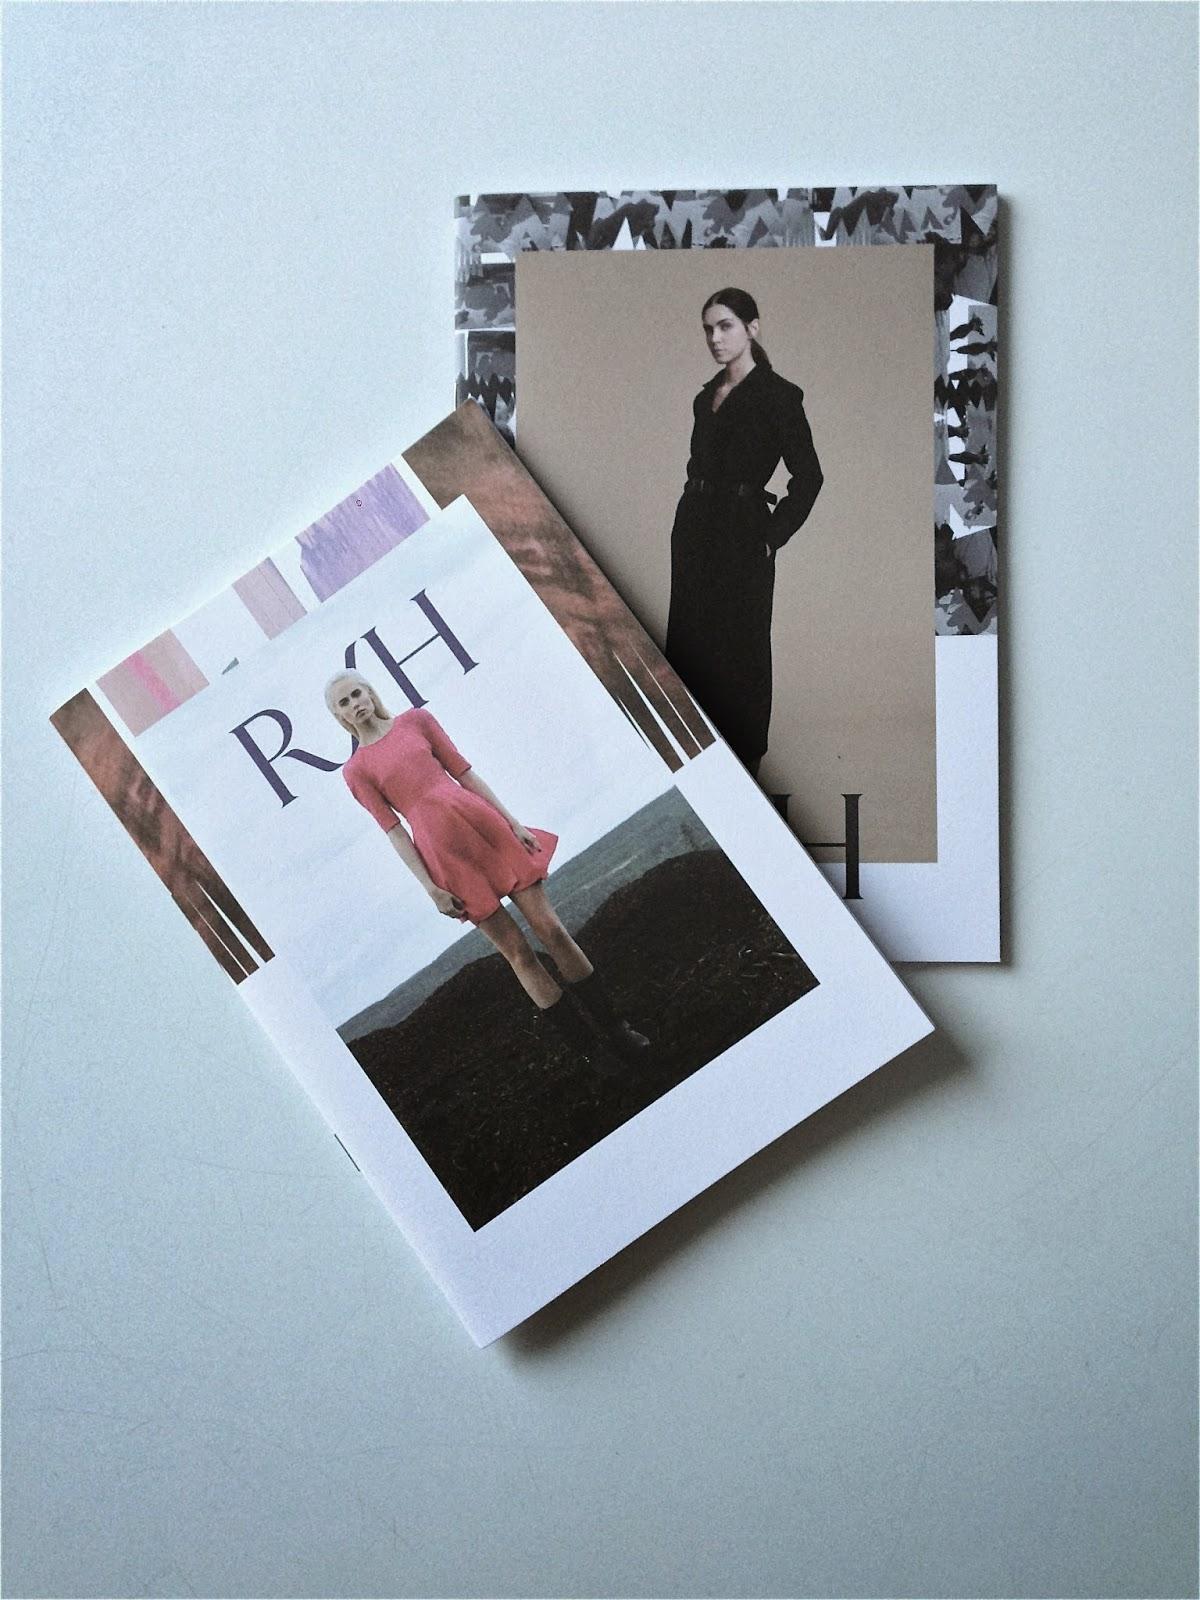 R/H Studio, R/H Store, White Lies, SS15